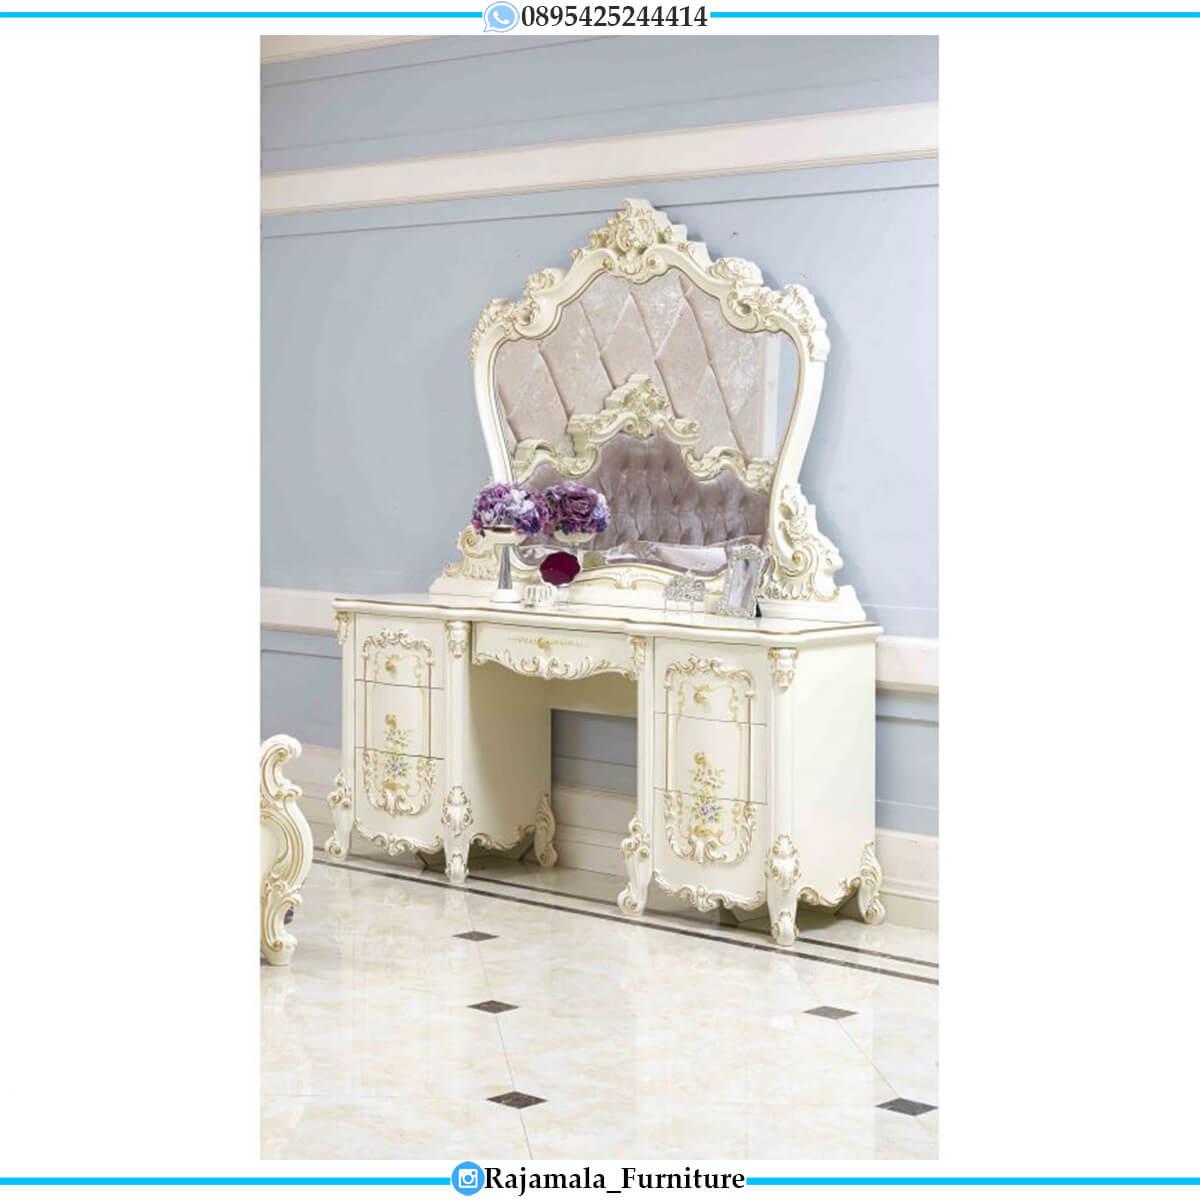 Best Sale Meja Rias Mewah Jepara Luxurious Style Furniture Jepara RM-0586